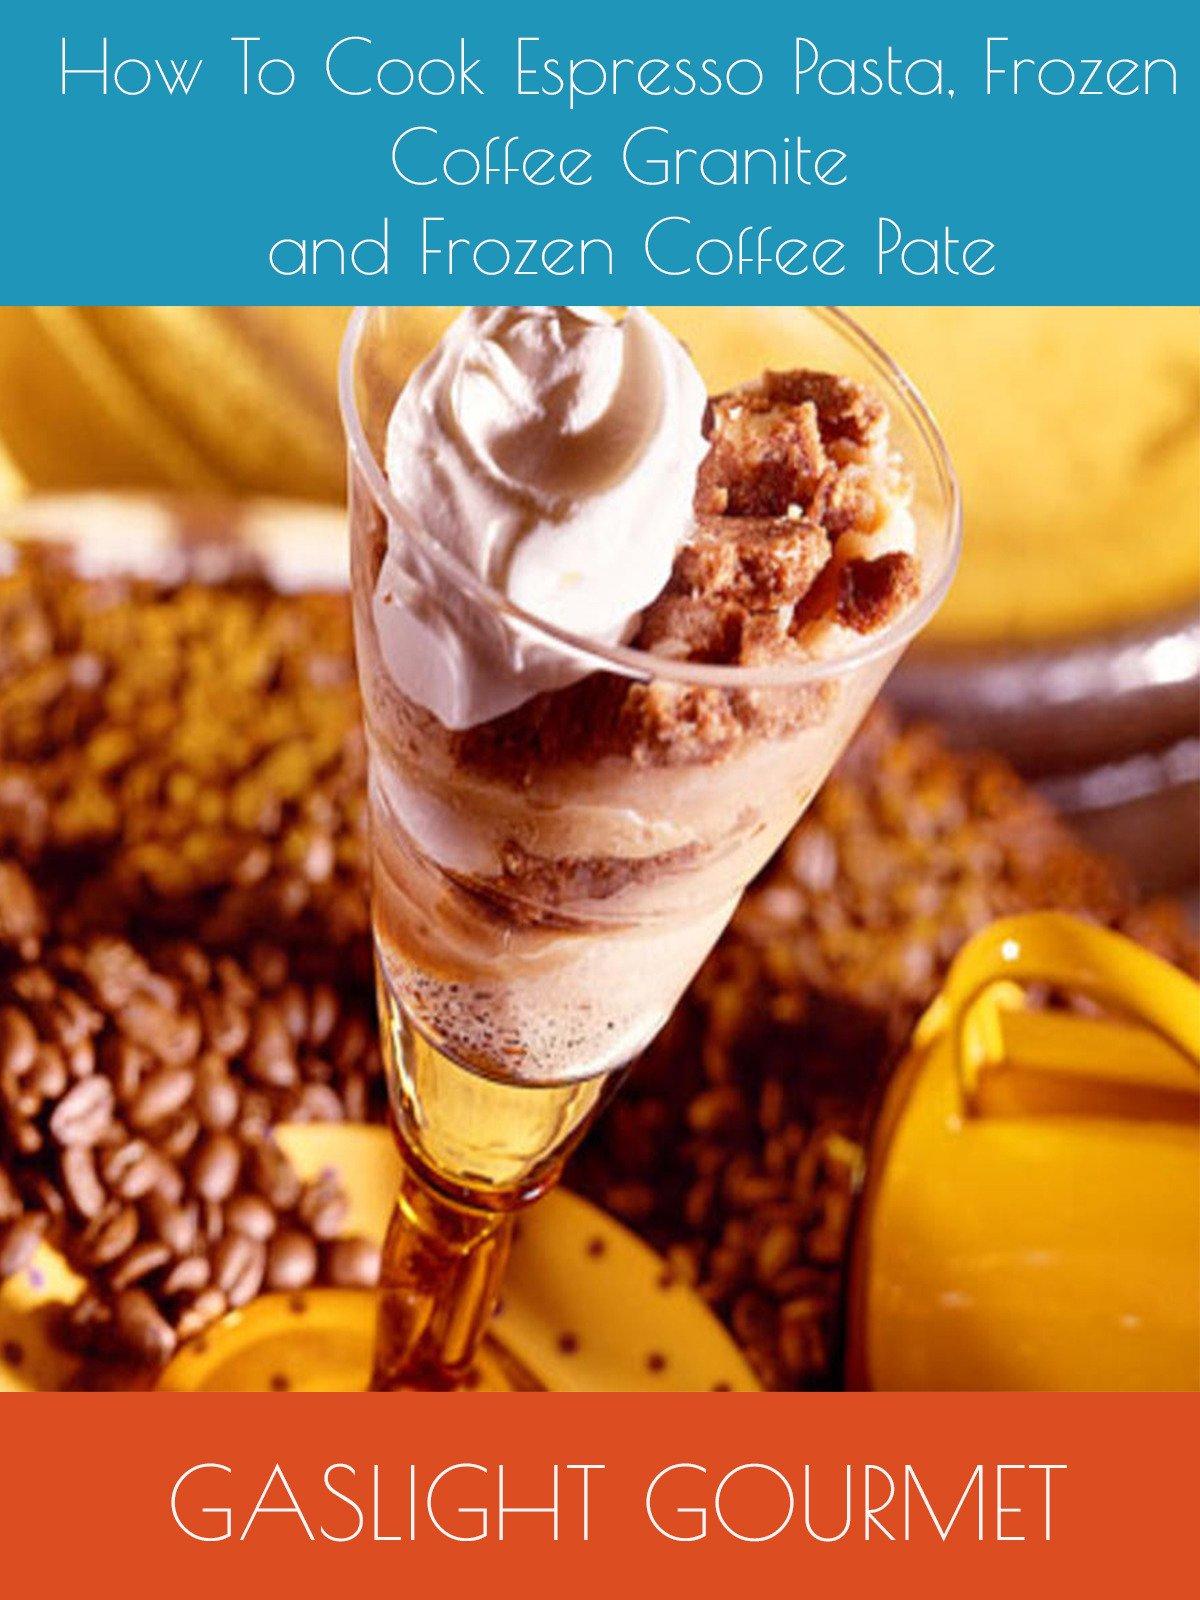 How To Cook Espresso Pasta, Frozen Coffee Granite and Frozen Coffee Pate on Amazon Prime Video UK